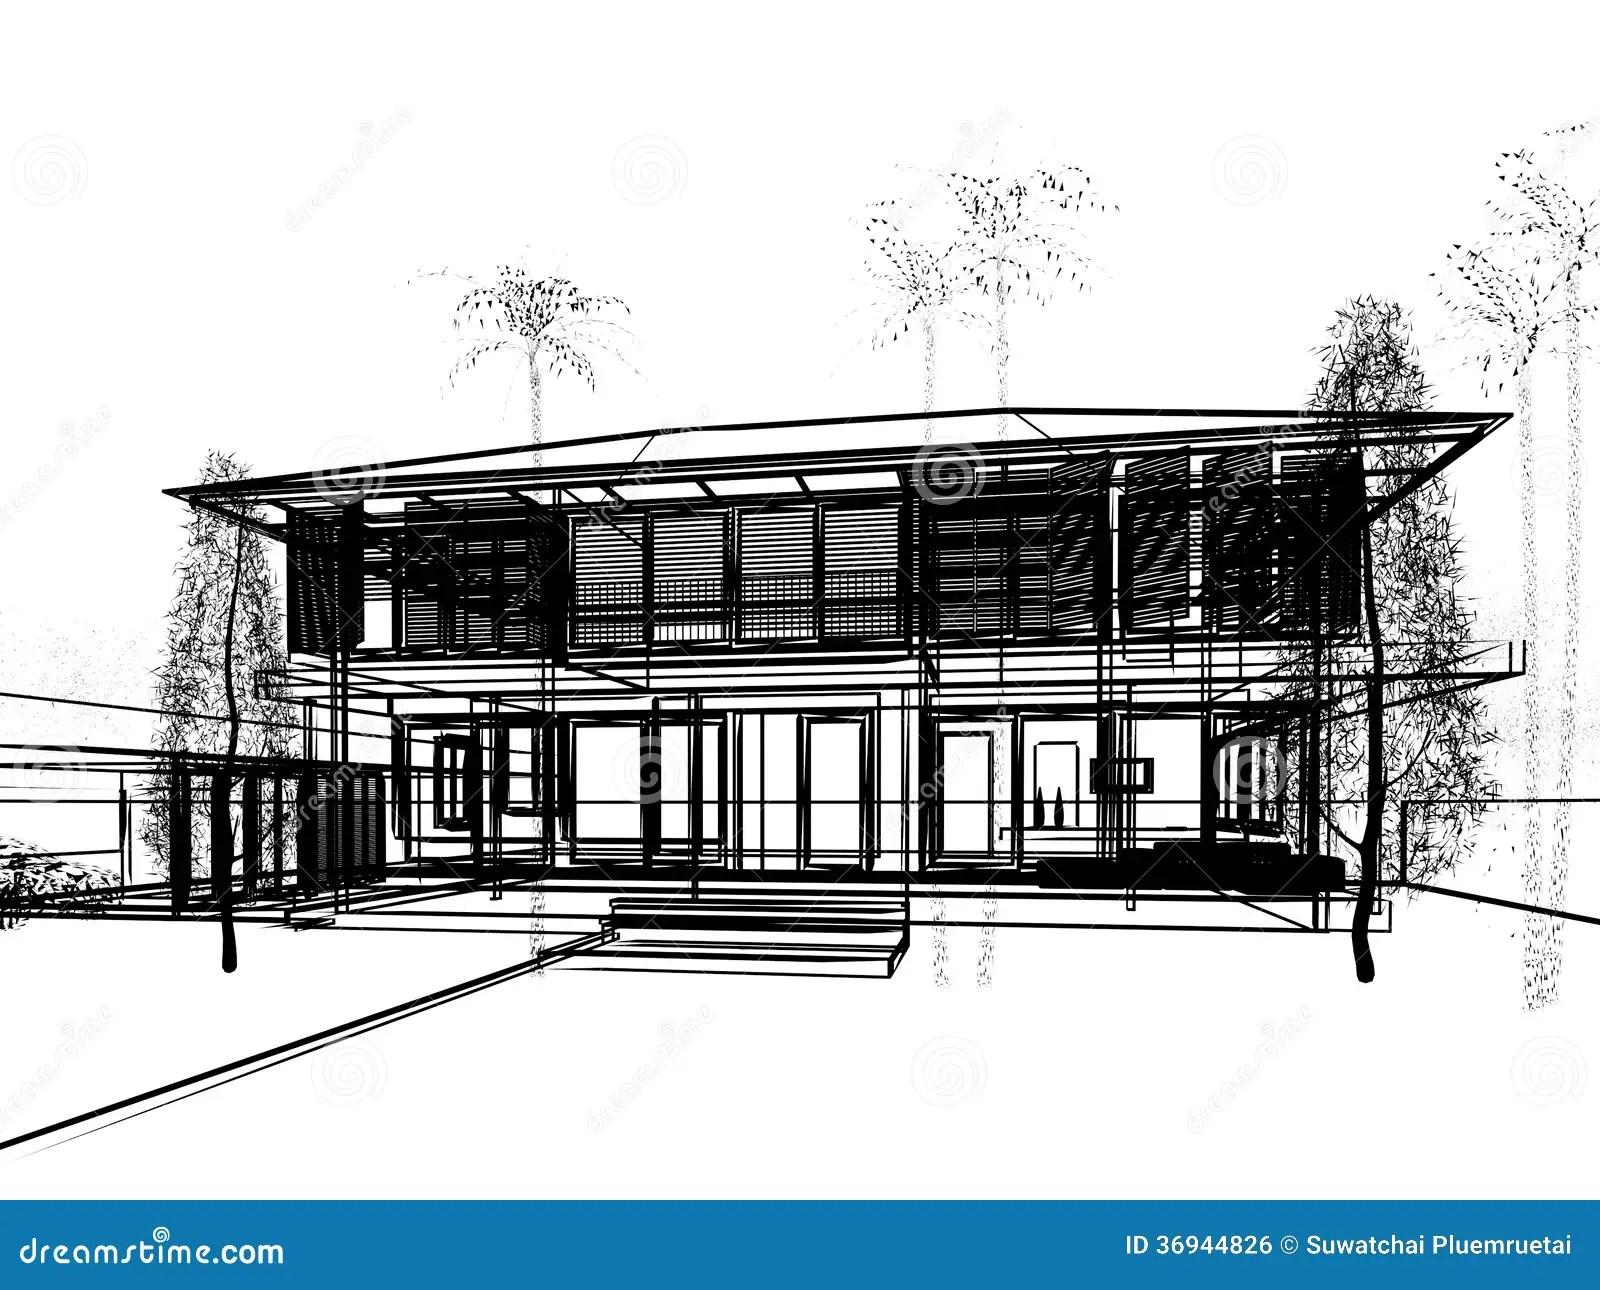 Sketch design of house stock illustration. Image of house